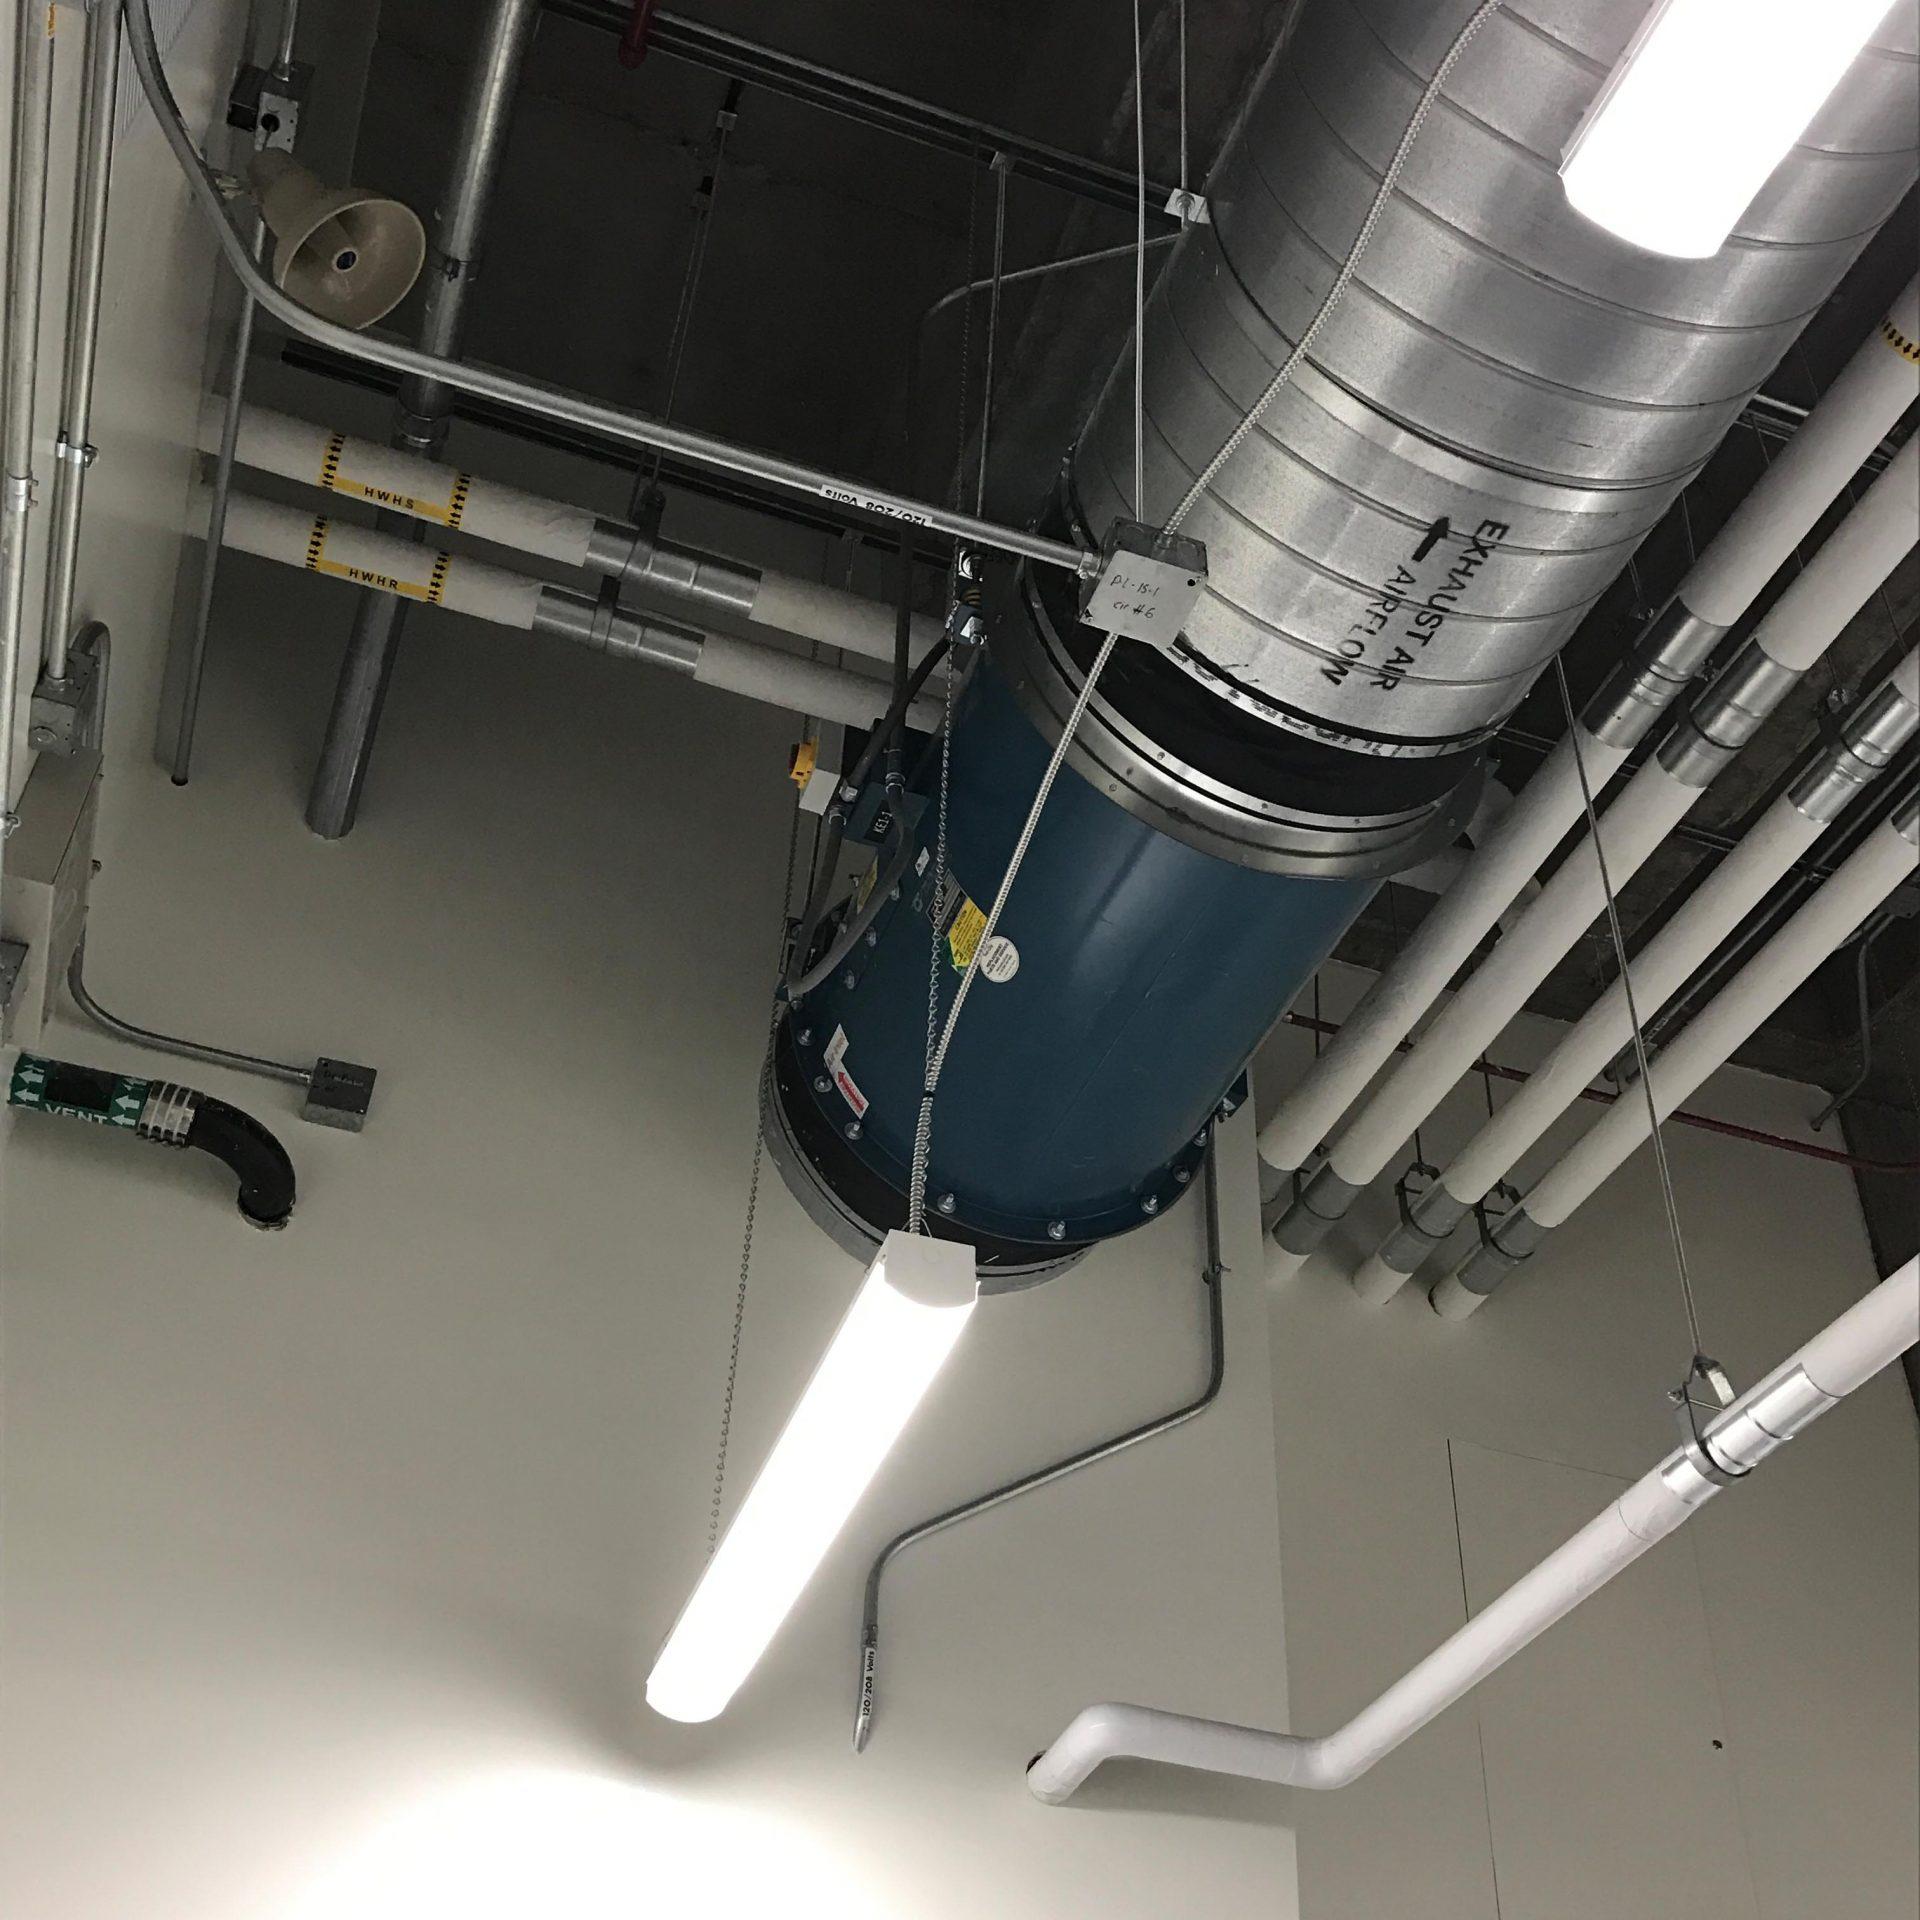 QSL - University Classroom Building Exhaust 4